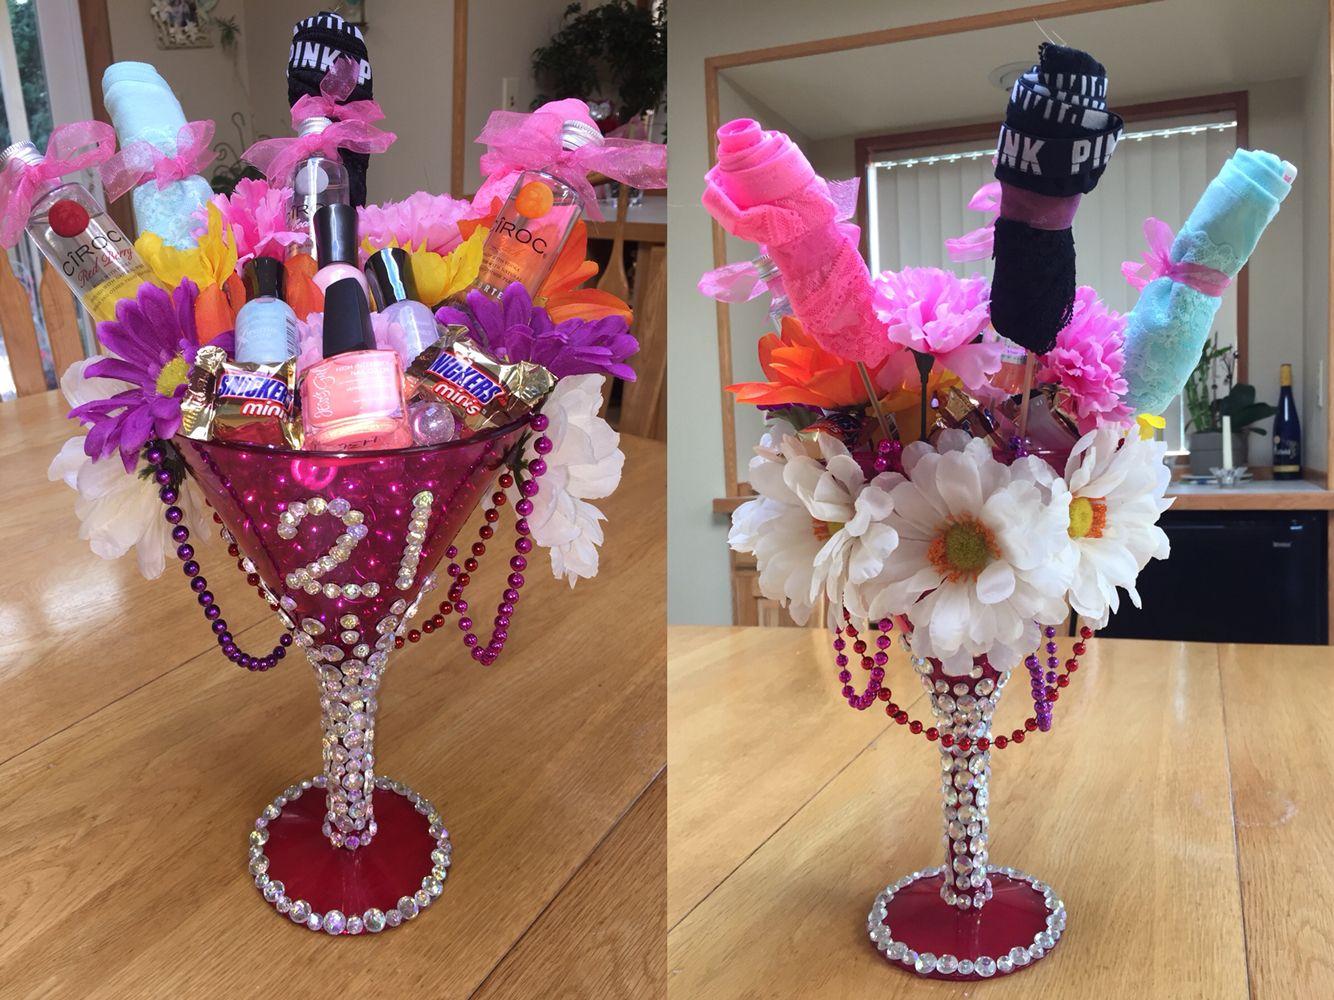 21st birthday gift idea for girls 21st birthday girl